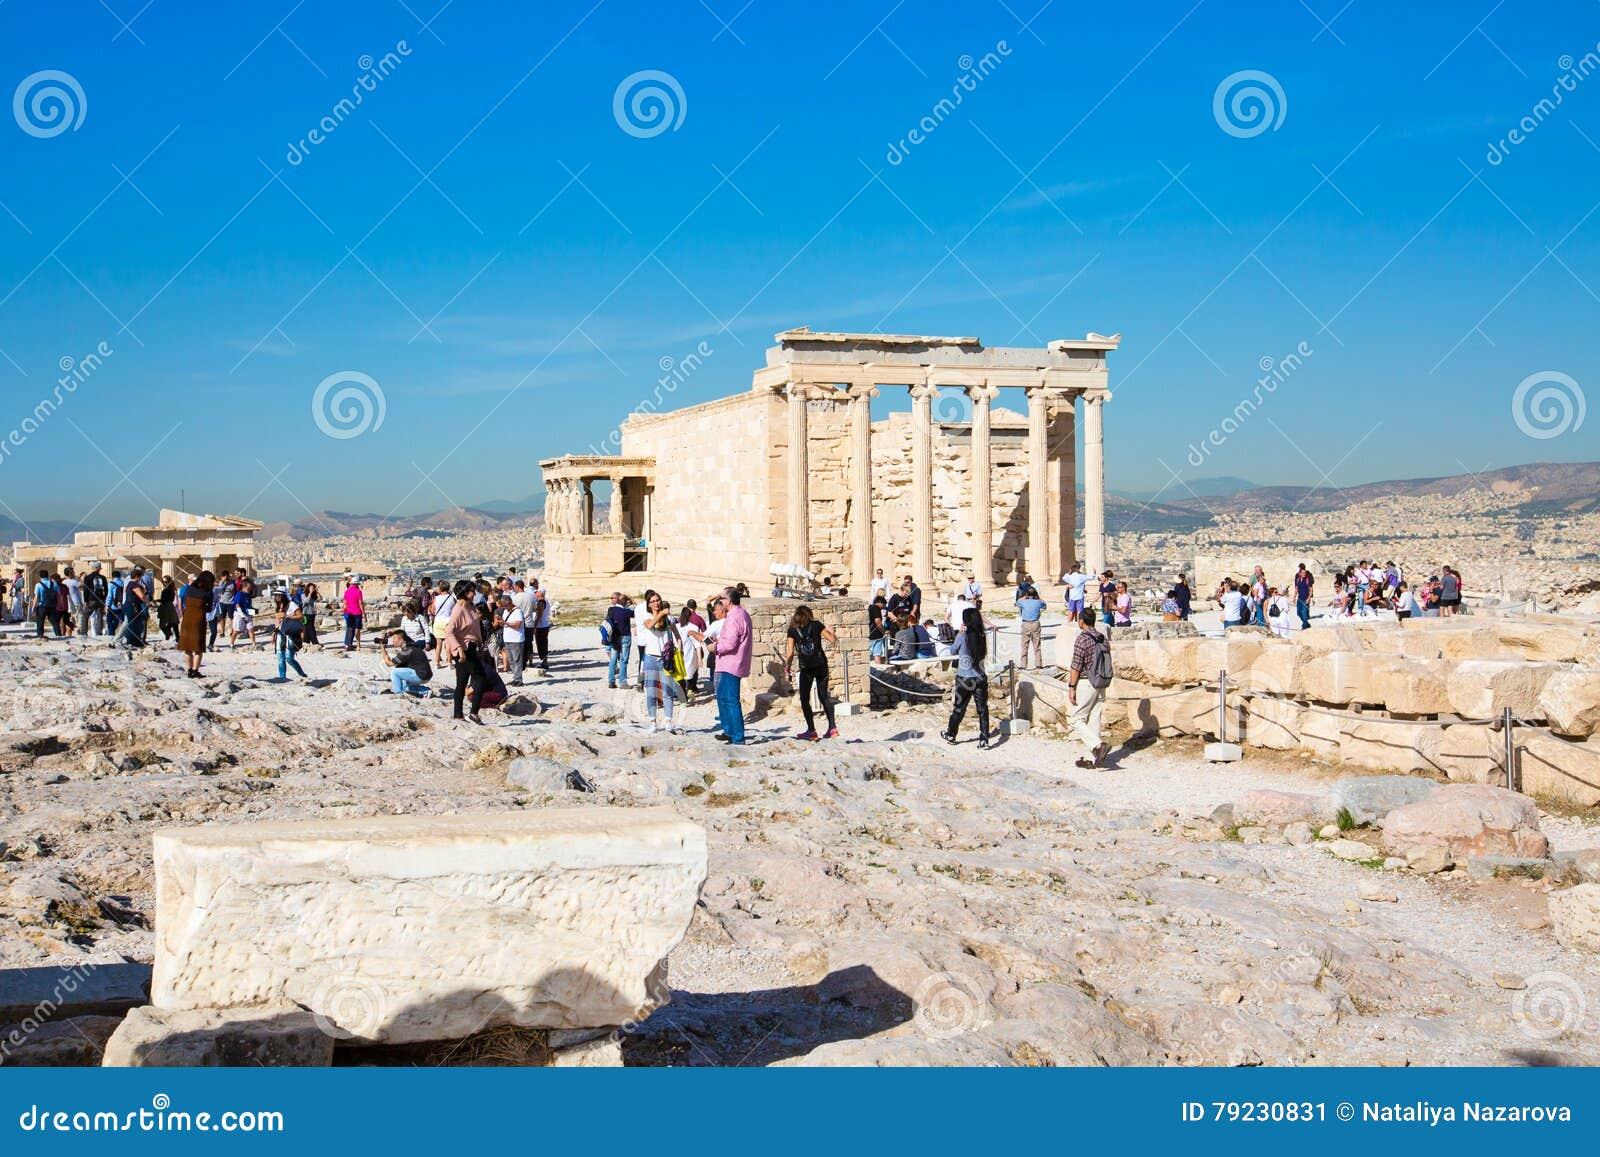 Tourists near Erechtheum temple ruins in Acropolis, Athens